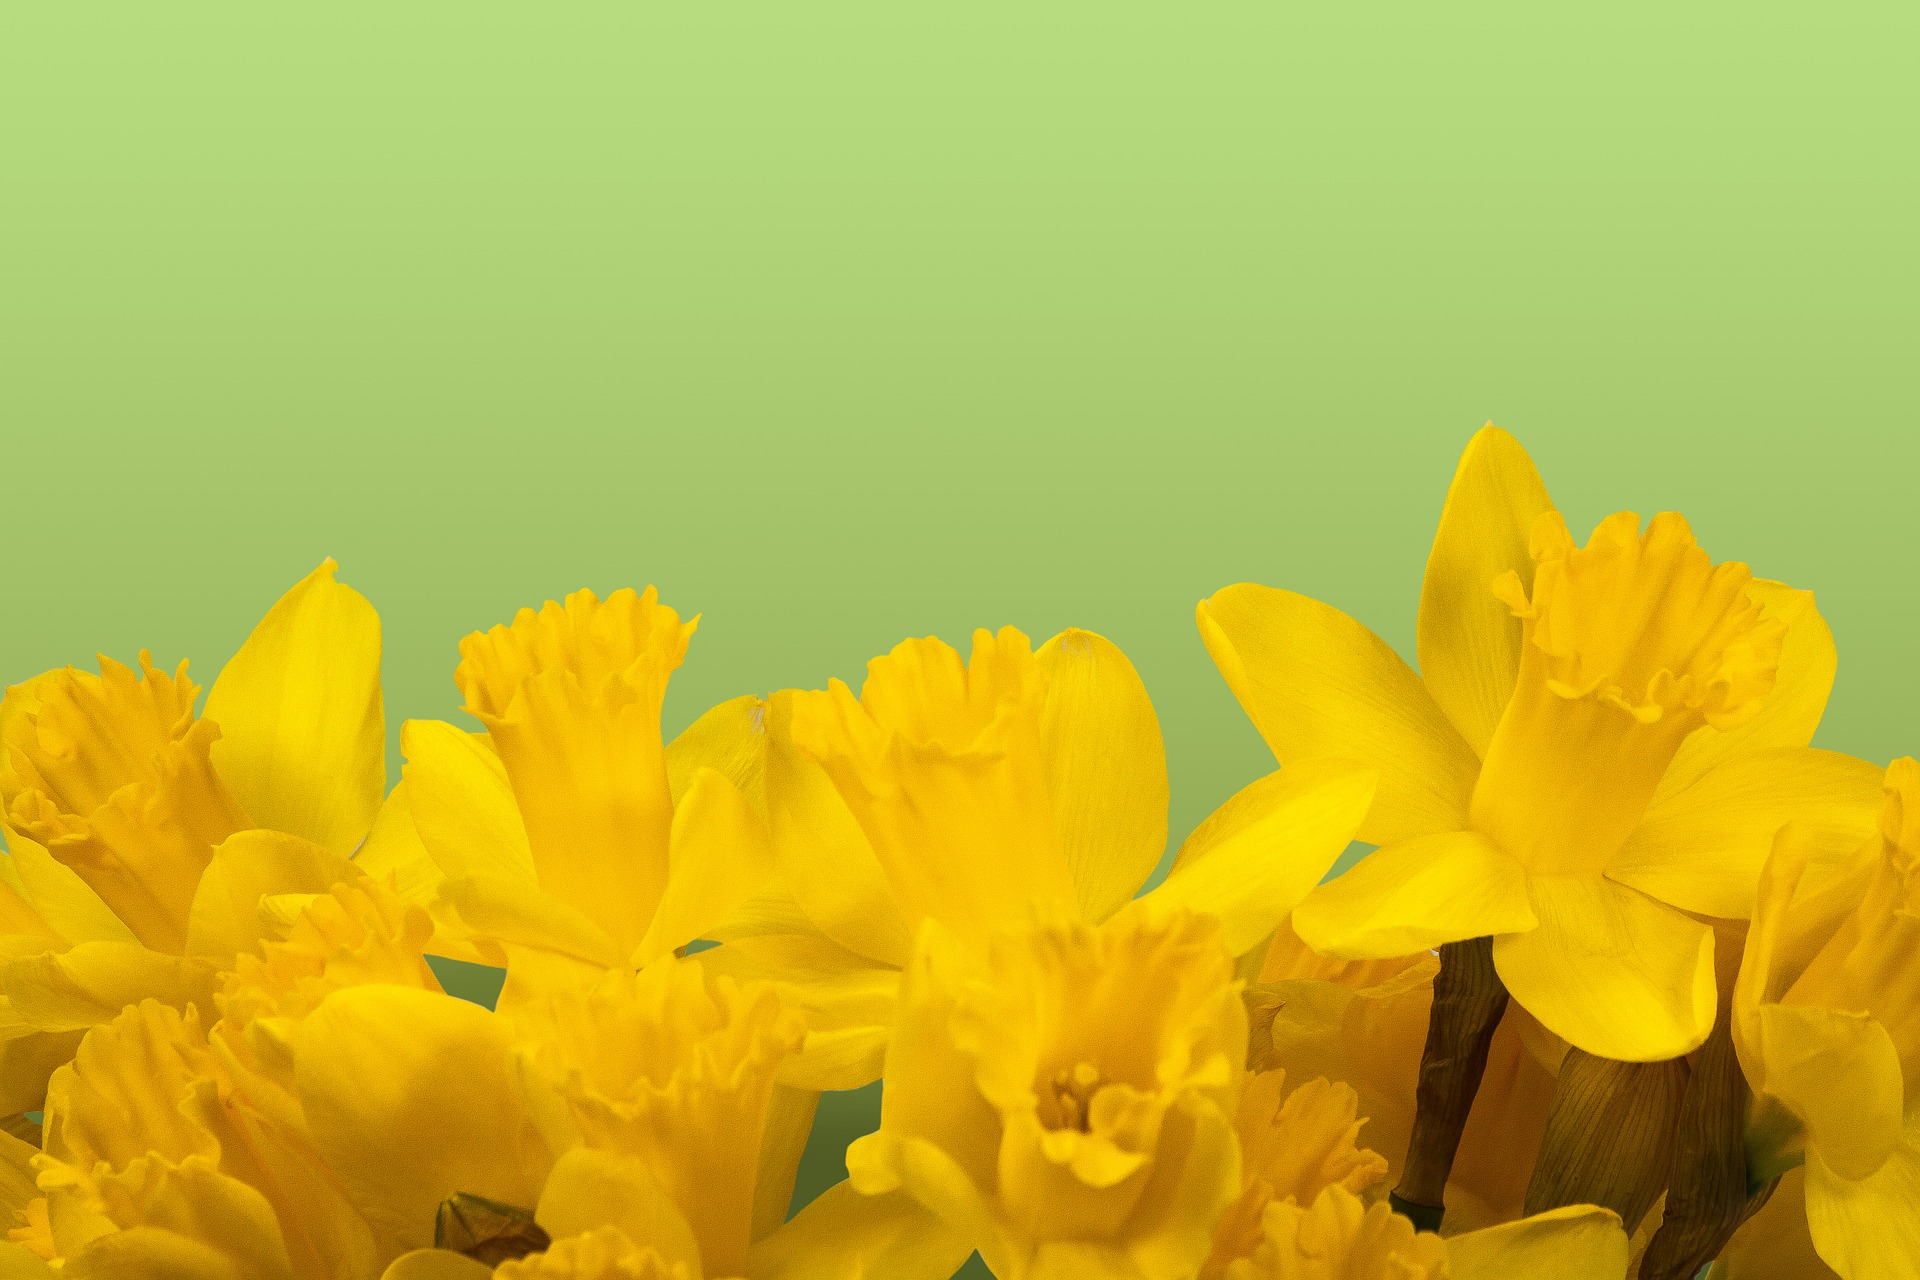 daffodil-1160904_1920.jpg